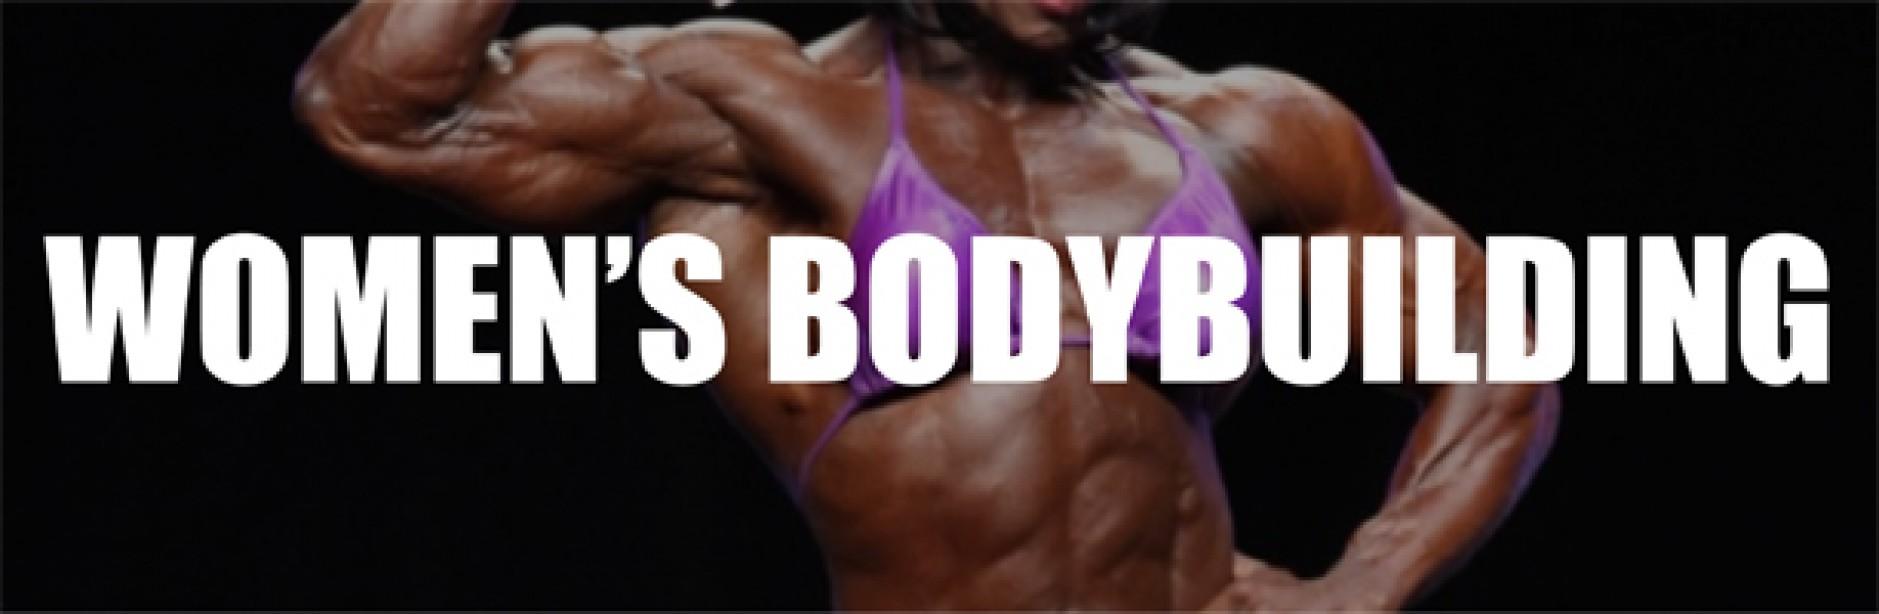 2015 NPC USA Championships Women's Bodybuilding Call Out Report